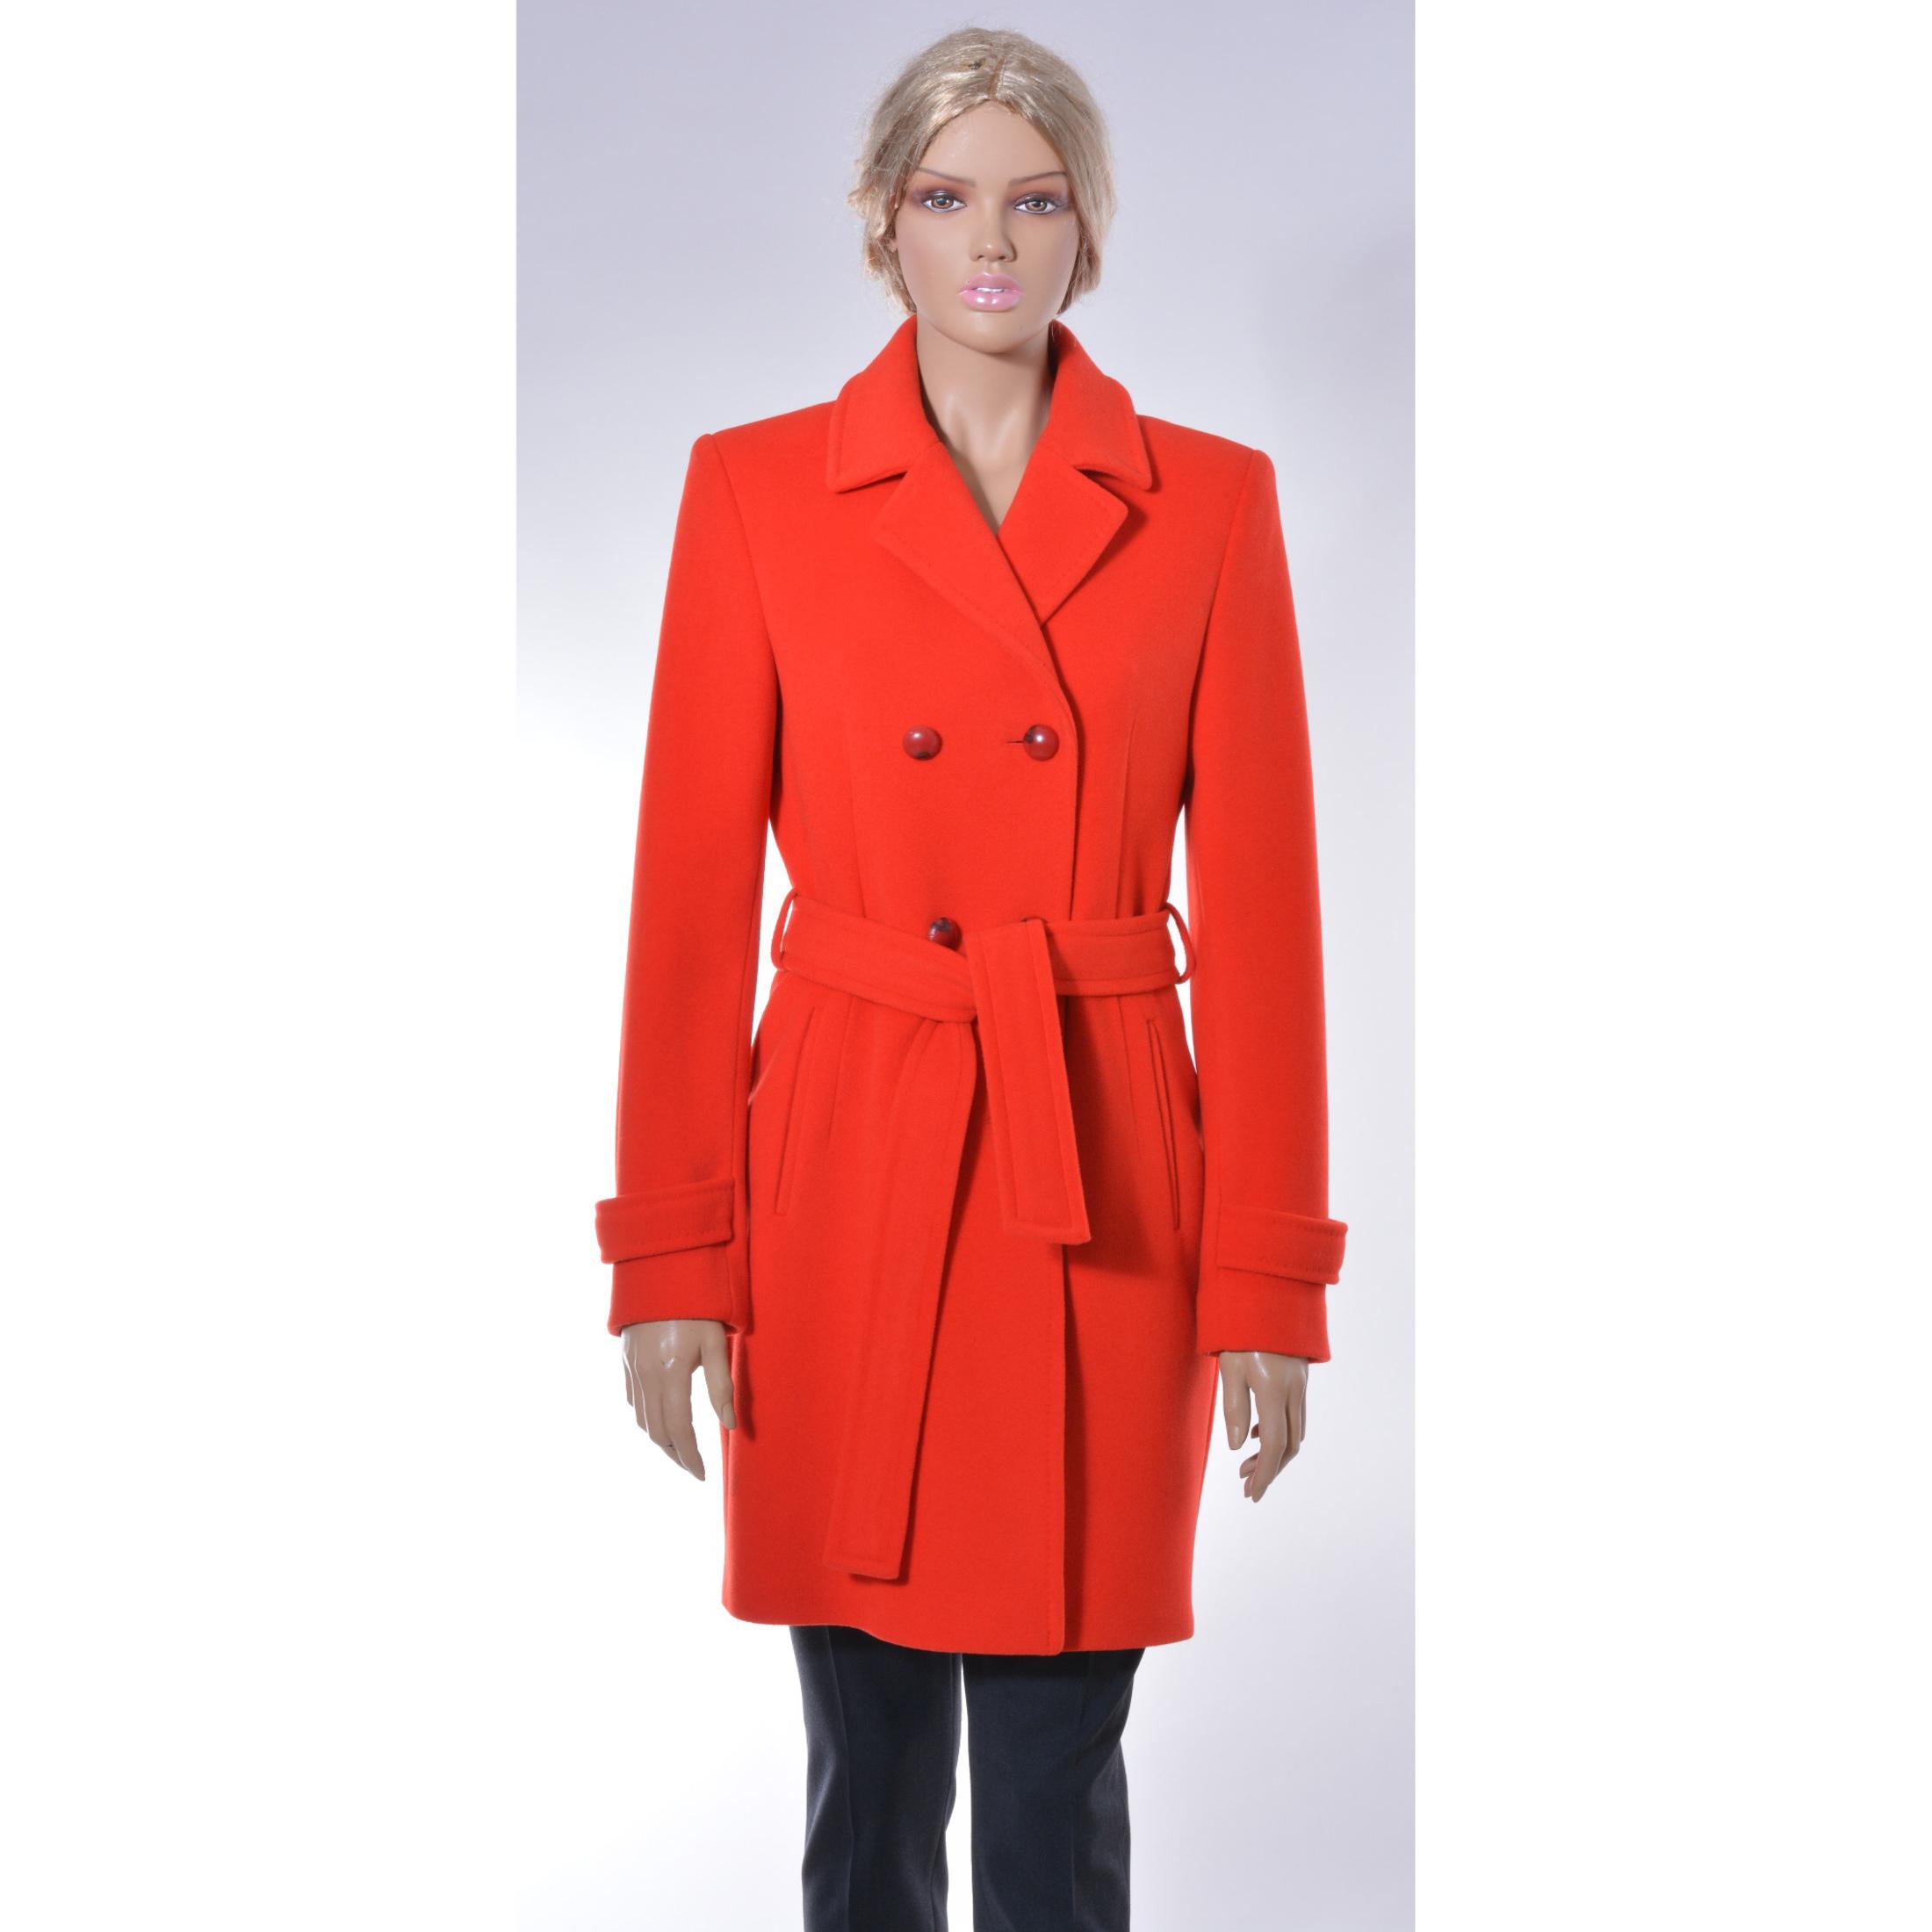 Elegant knee-length coat , red coat, Luxuriant and radiant red coat